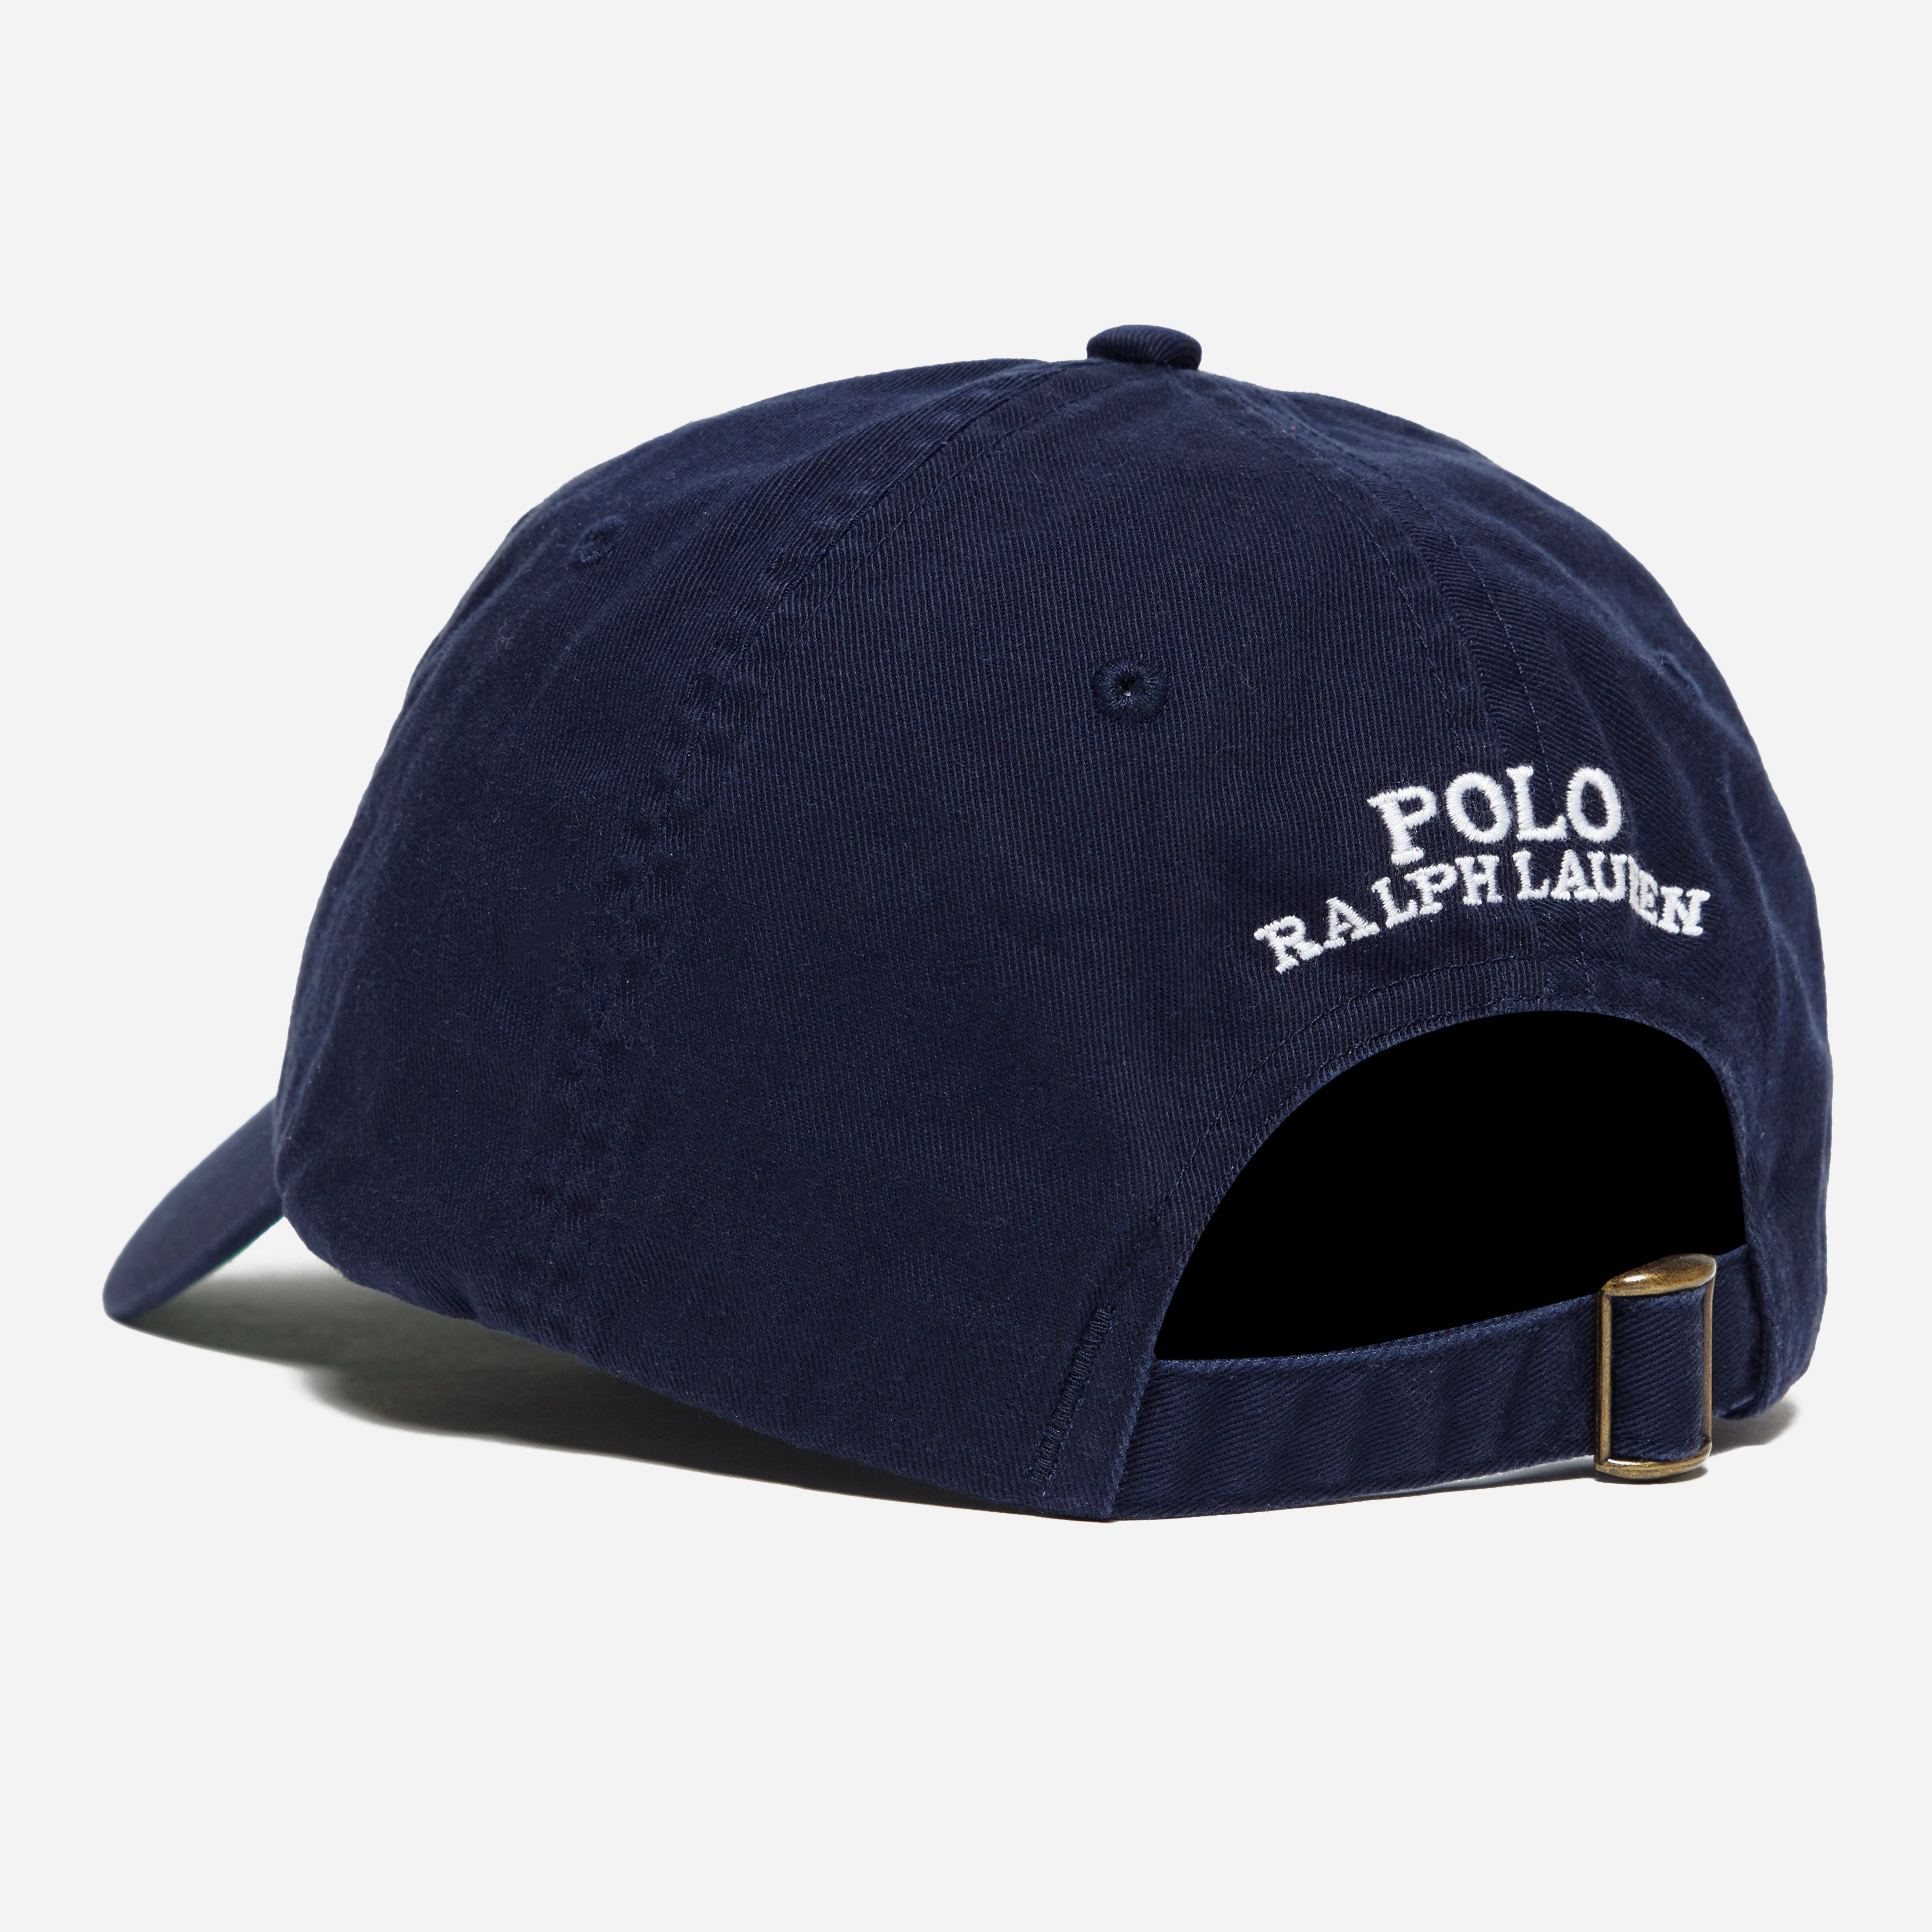 Polo Ralph Lauren CP-93 Chino Sport Cap